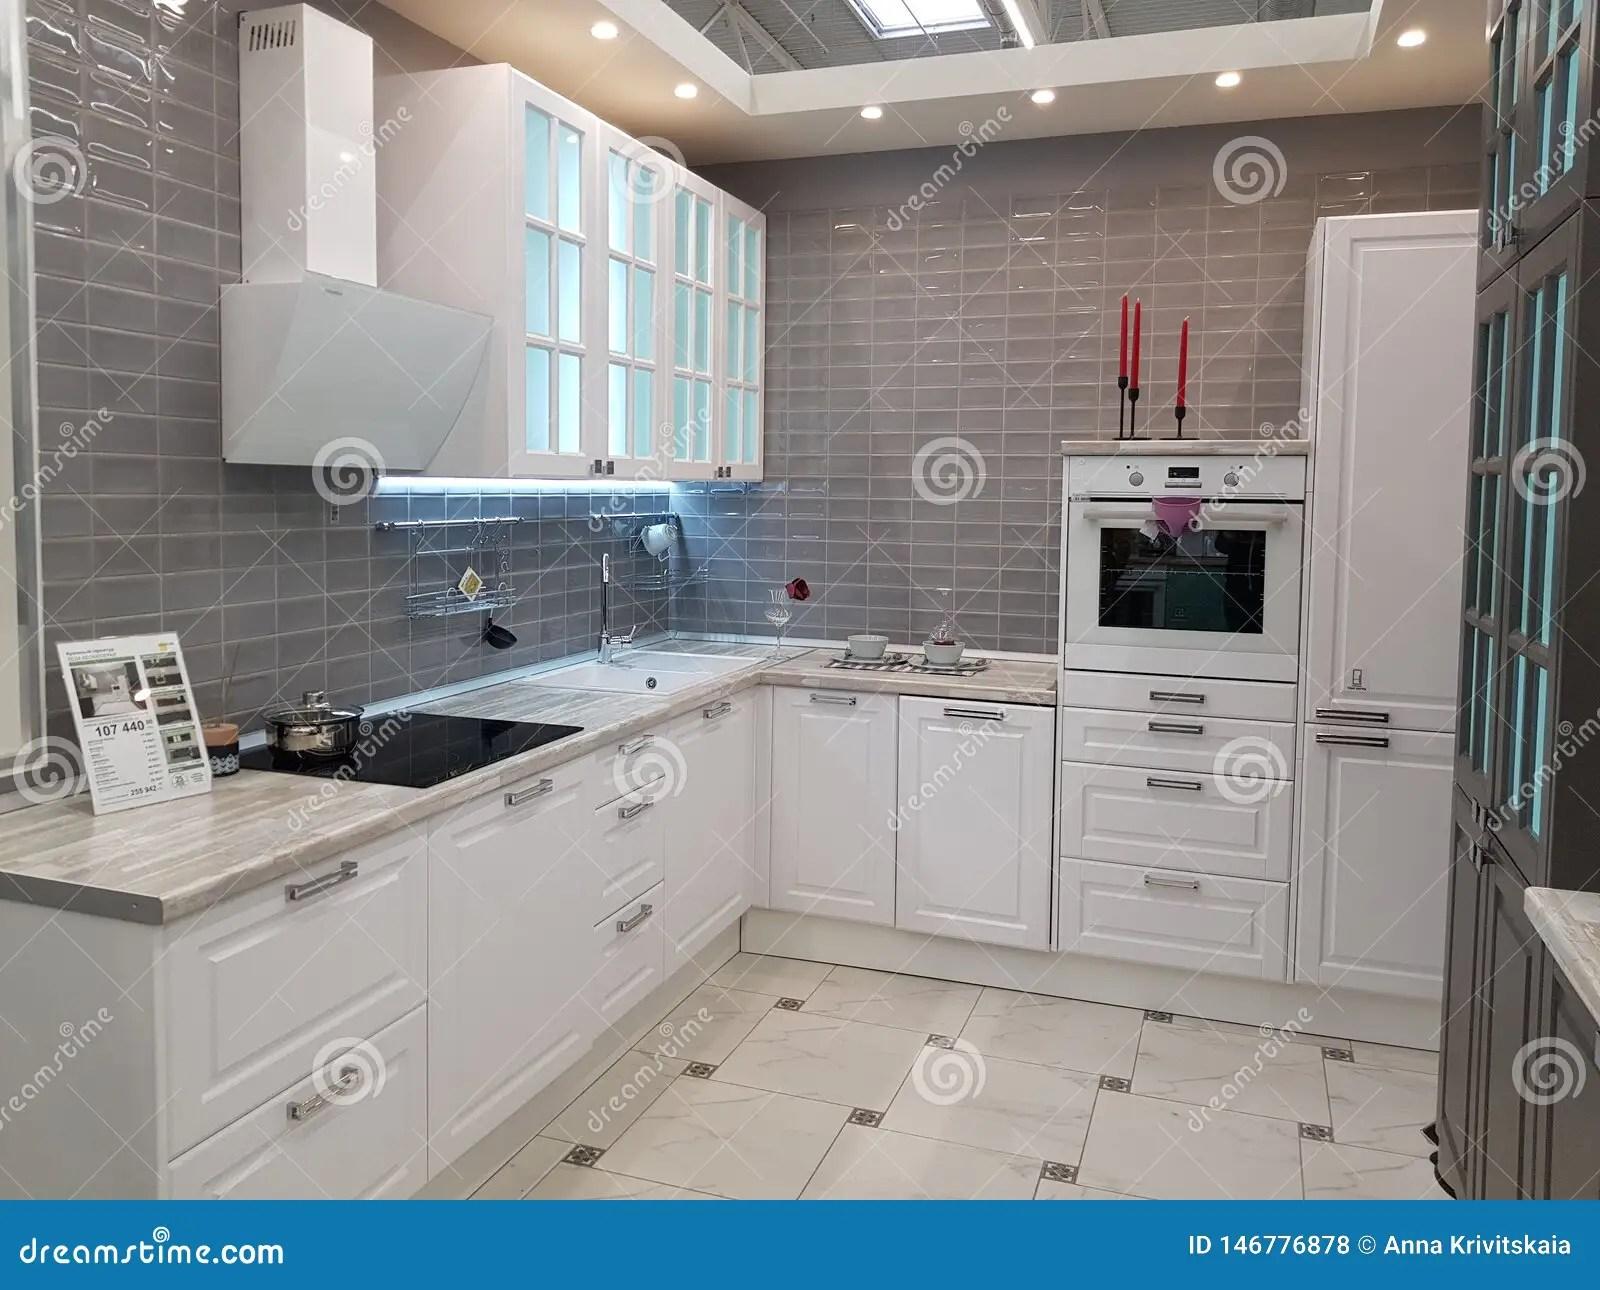 https fr dreamstime com belles cuisines modernes magasin meubles russie st petersburg image146776878